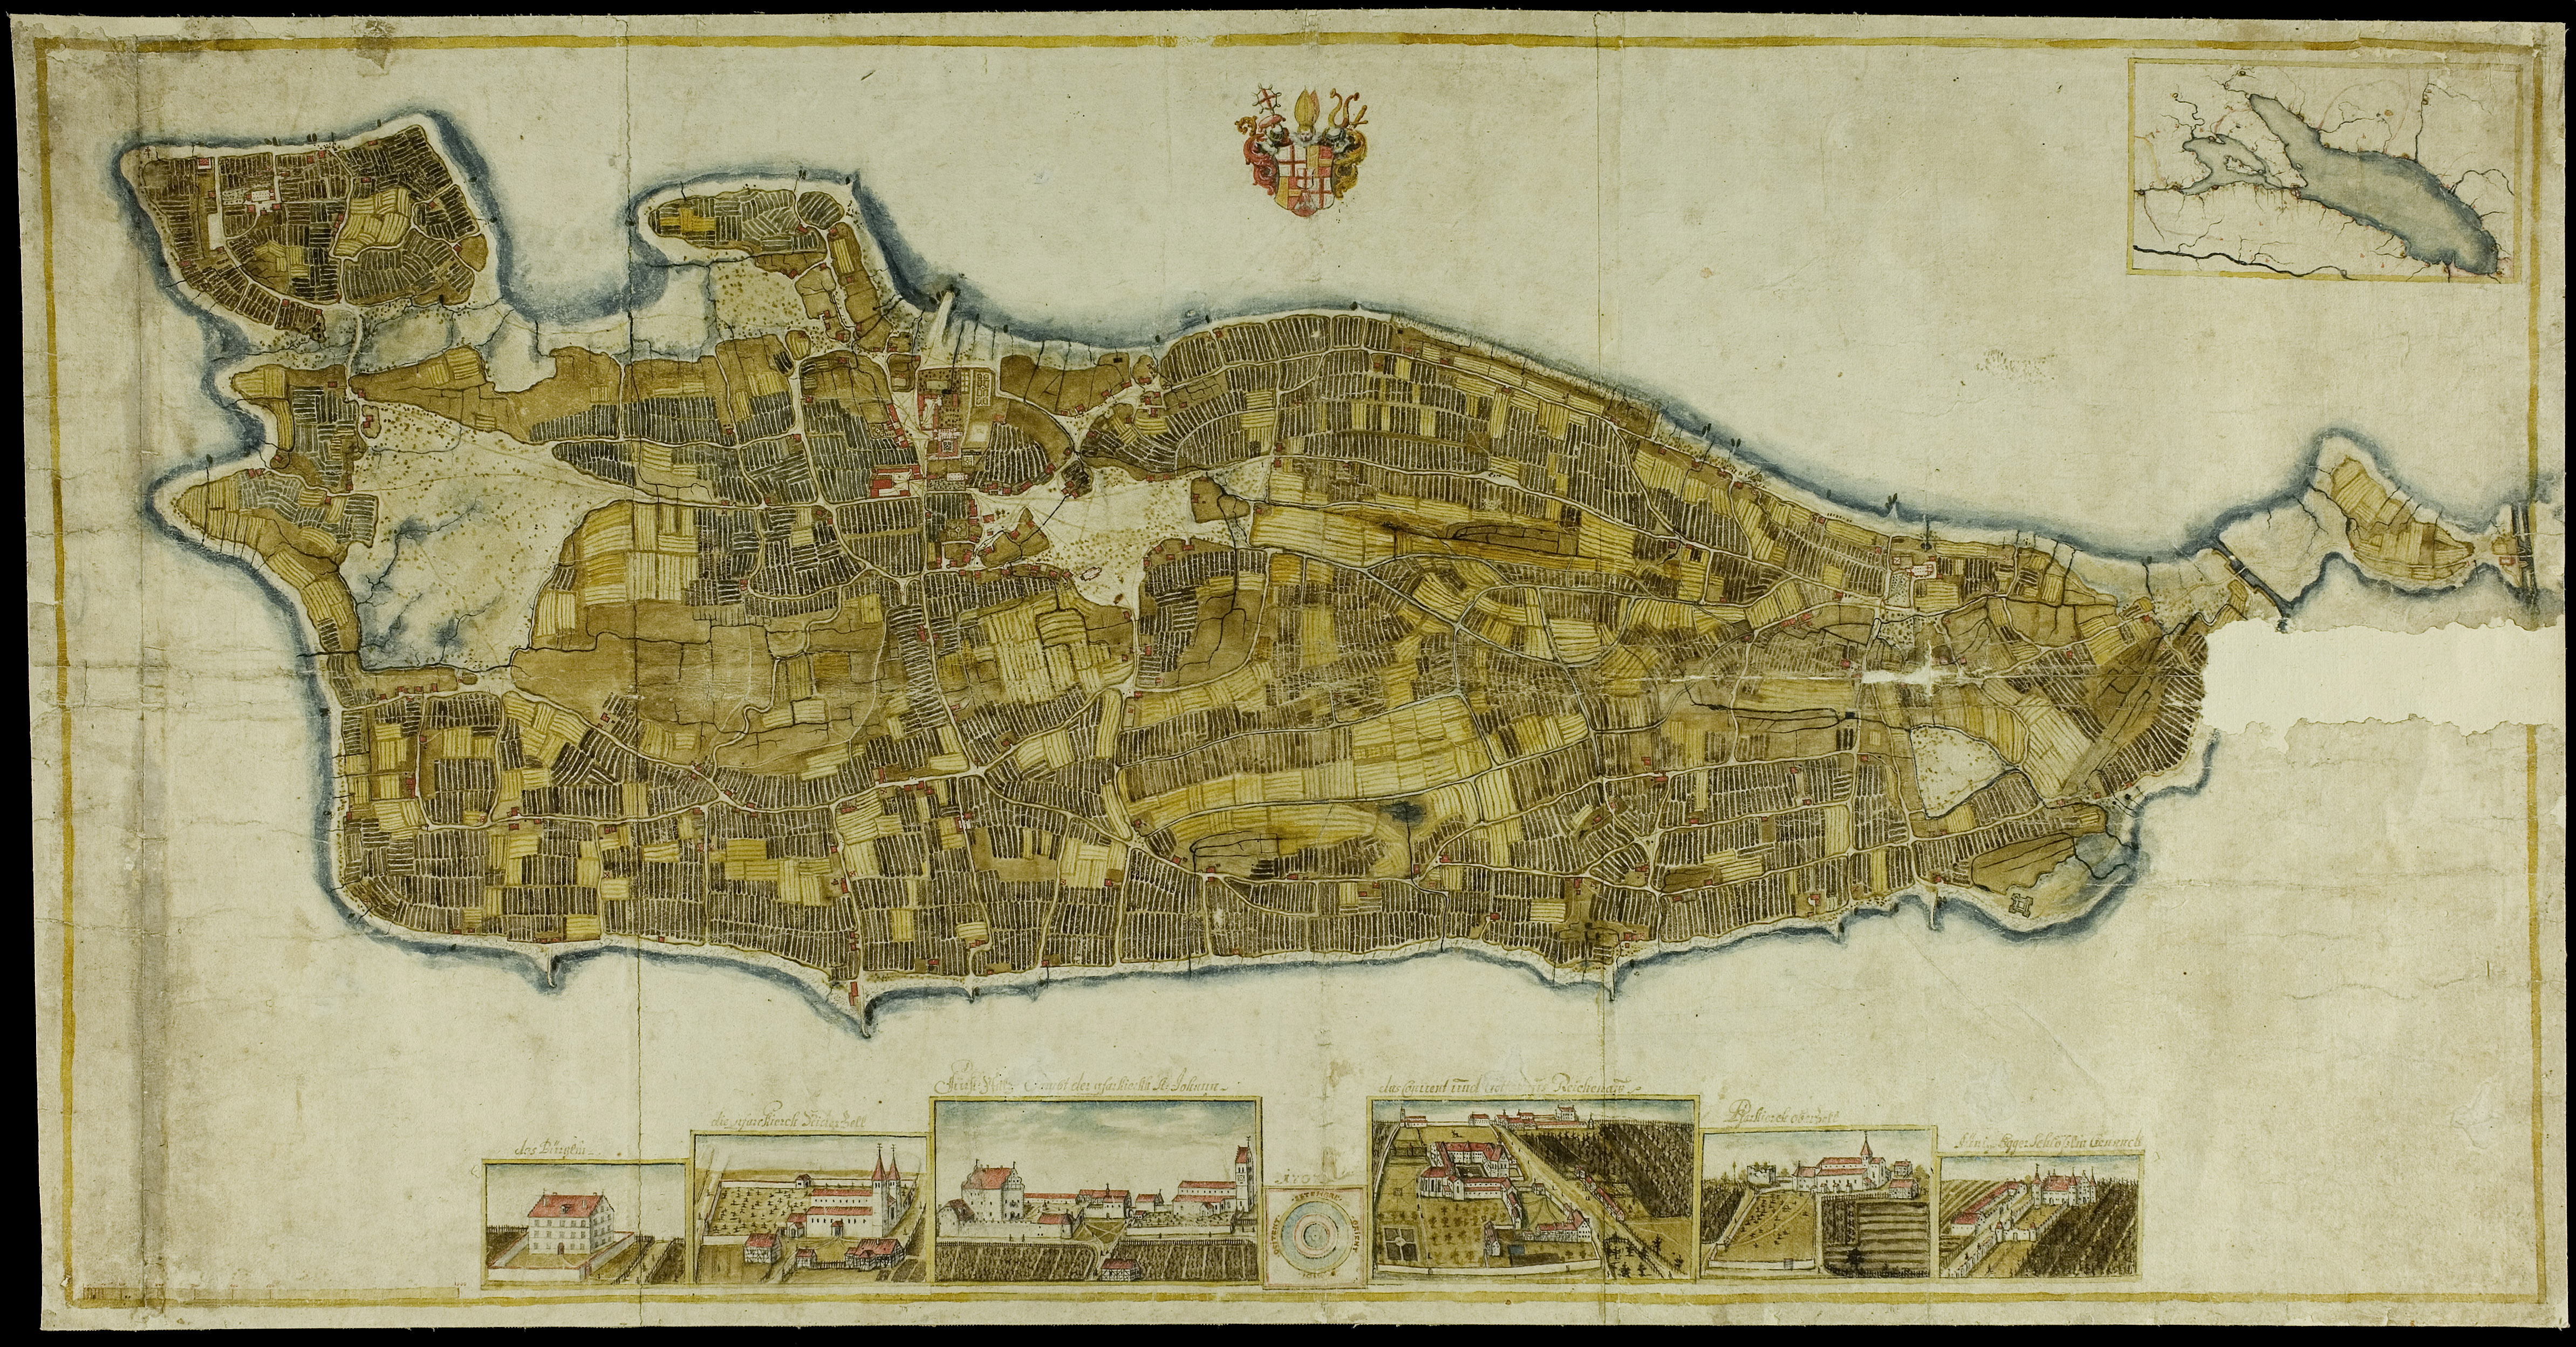 Insel Reichenau Karte.Datei Insel Reichenau Karte 1707 Jpg Wikipedia